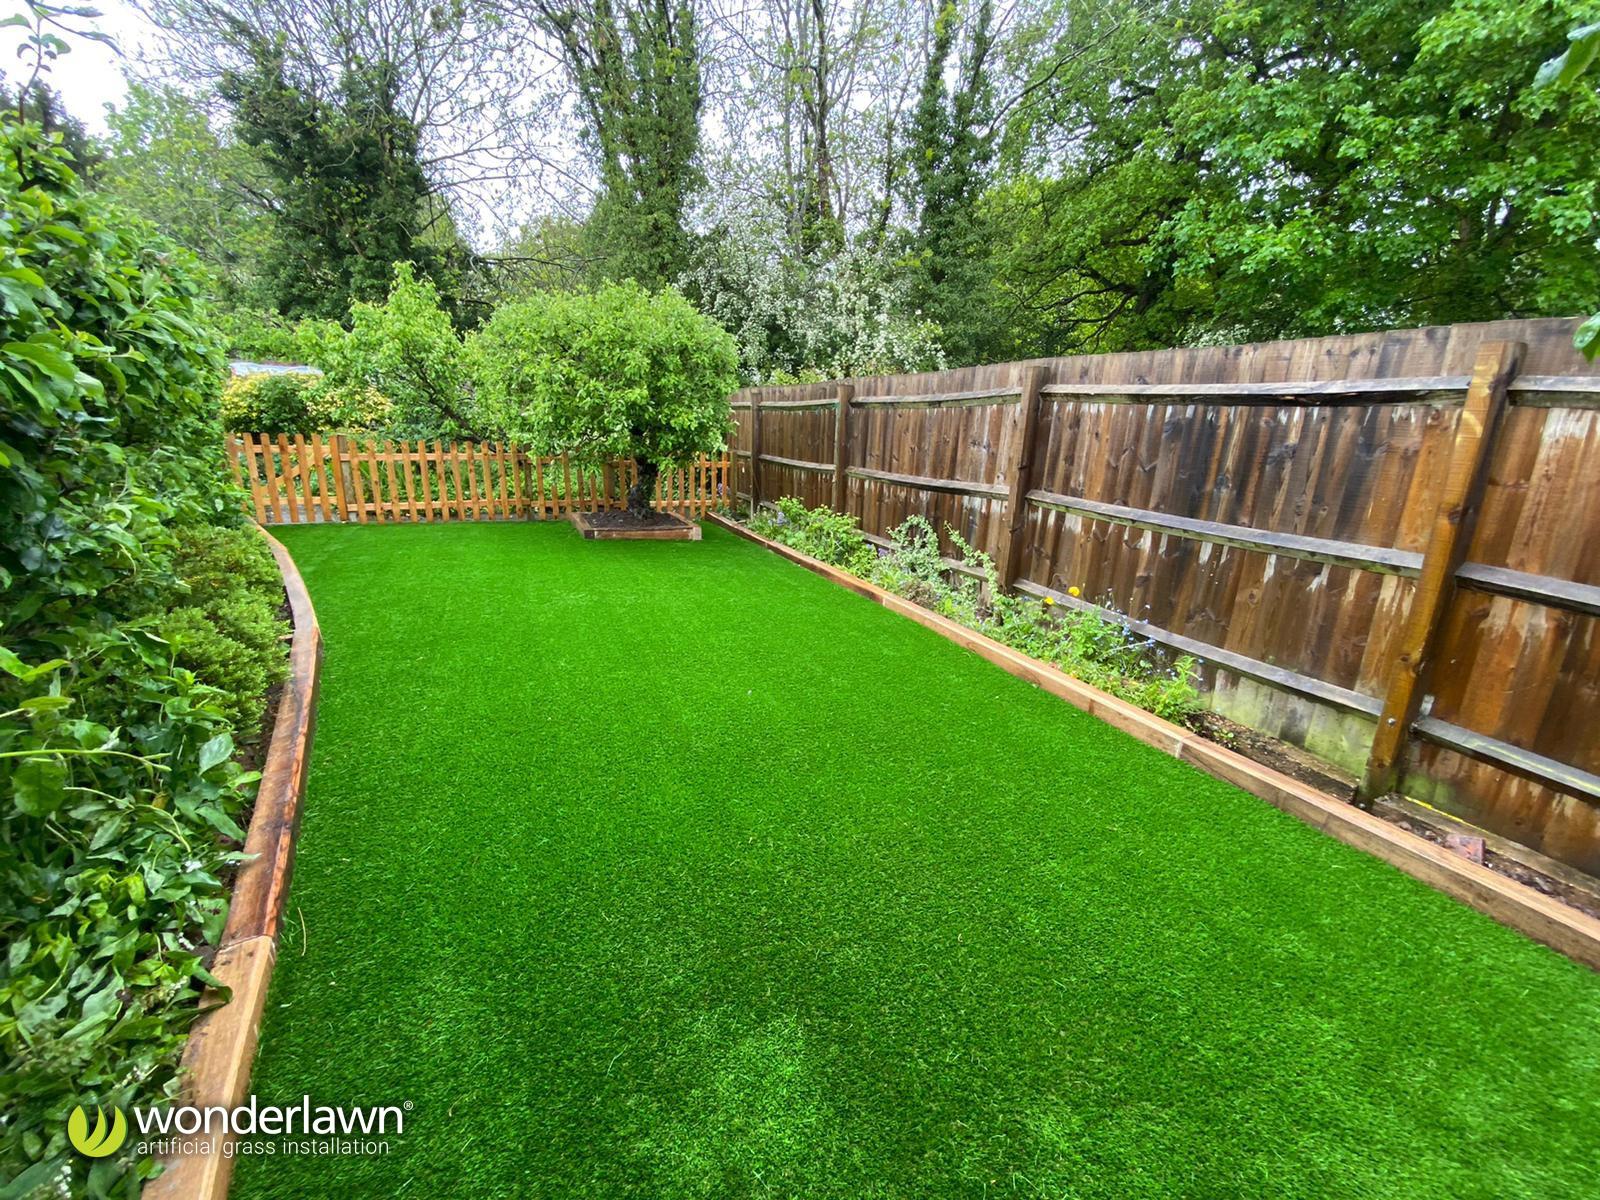 Artificial grass installed in Birmingham